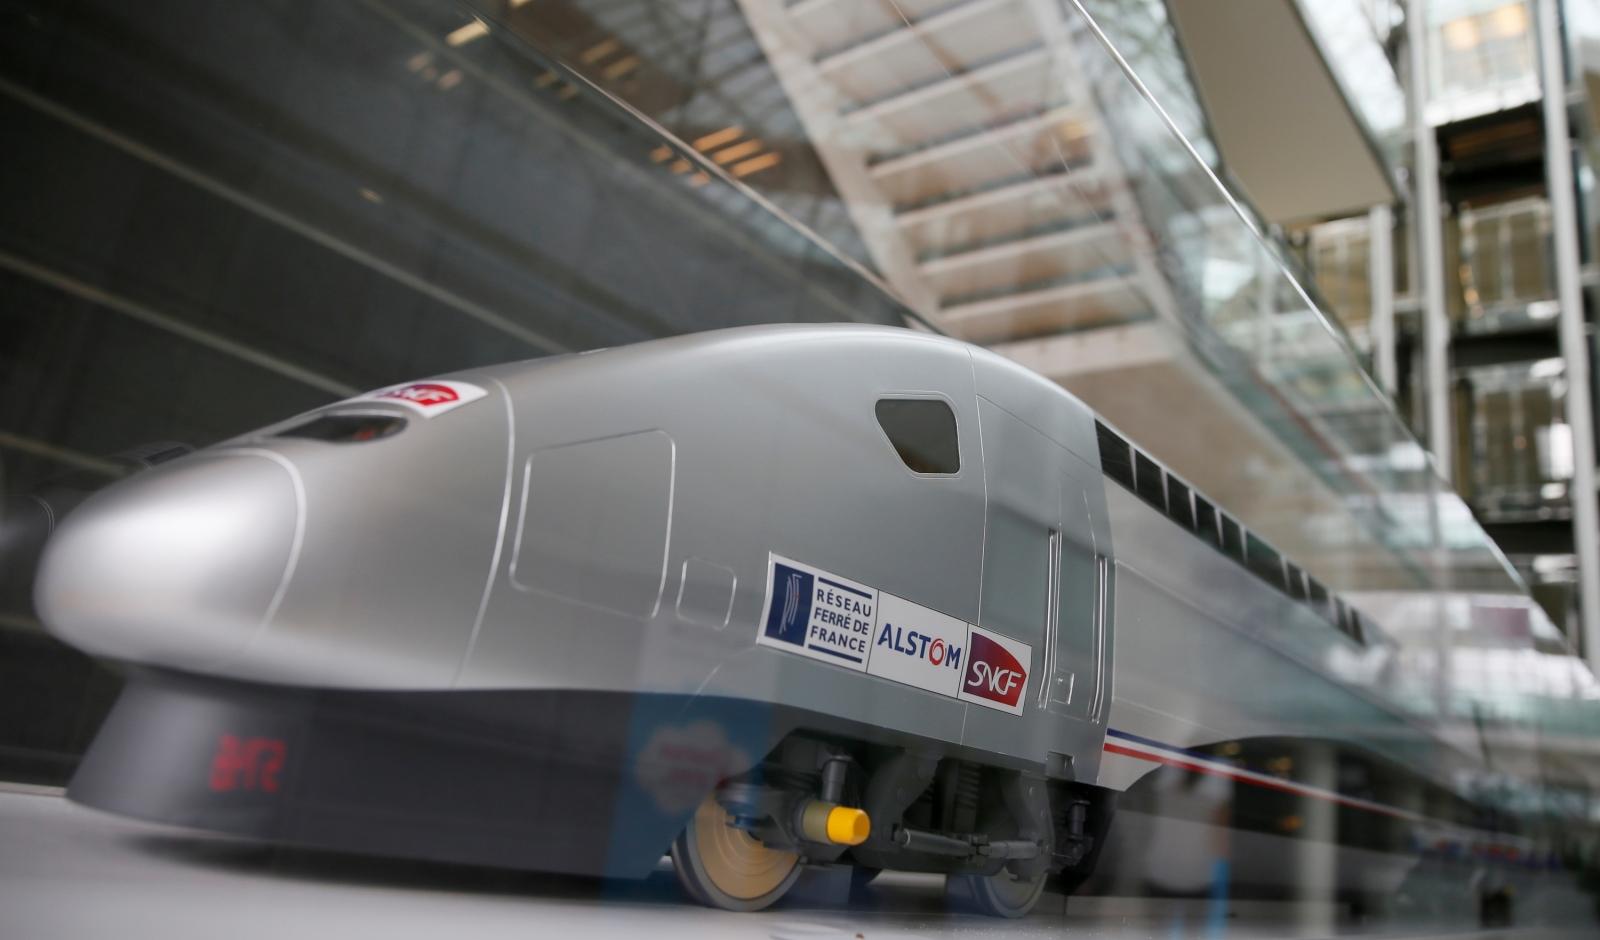 Biden announces $2.45 billion federal loan to Amtrak